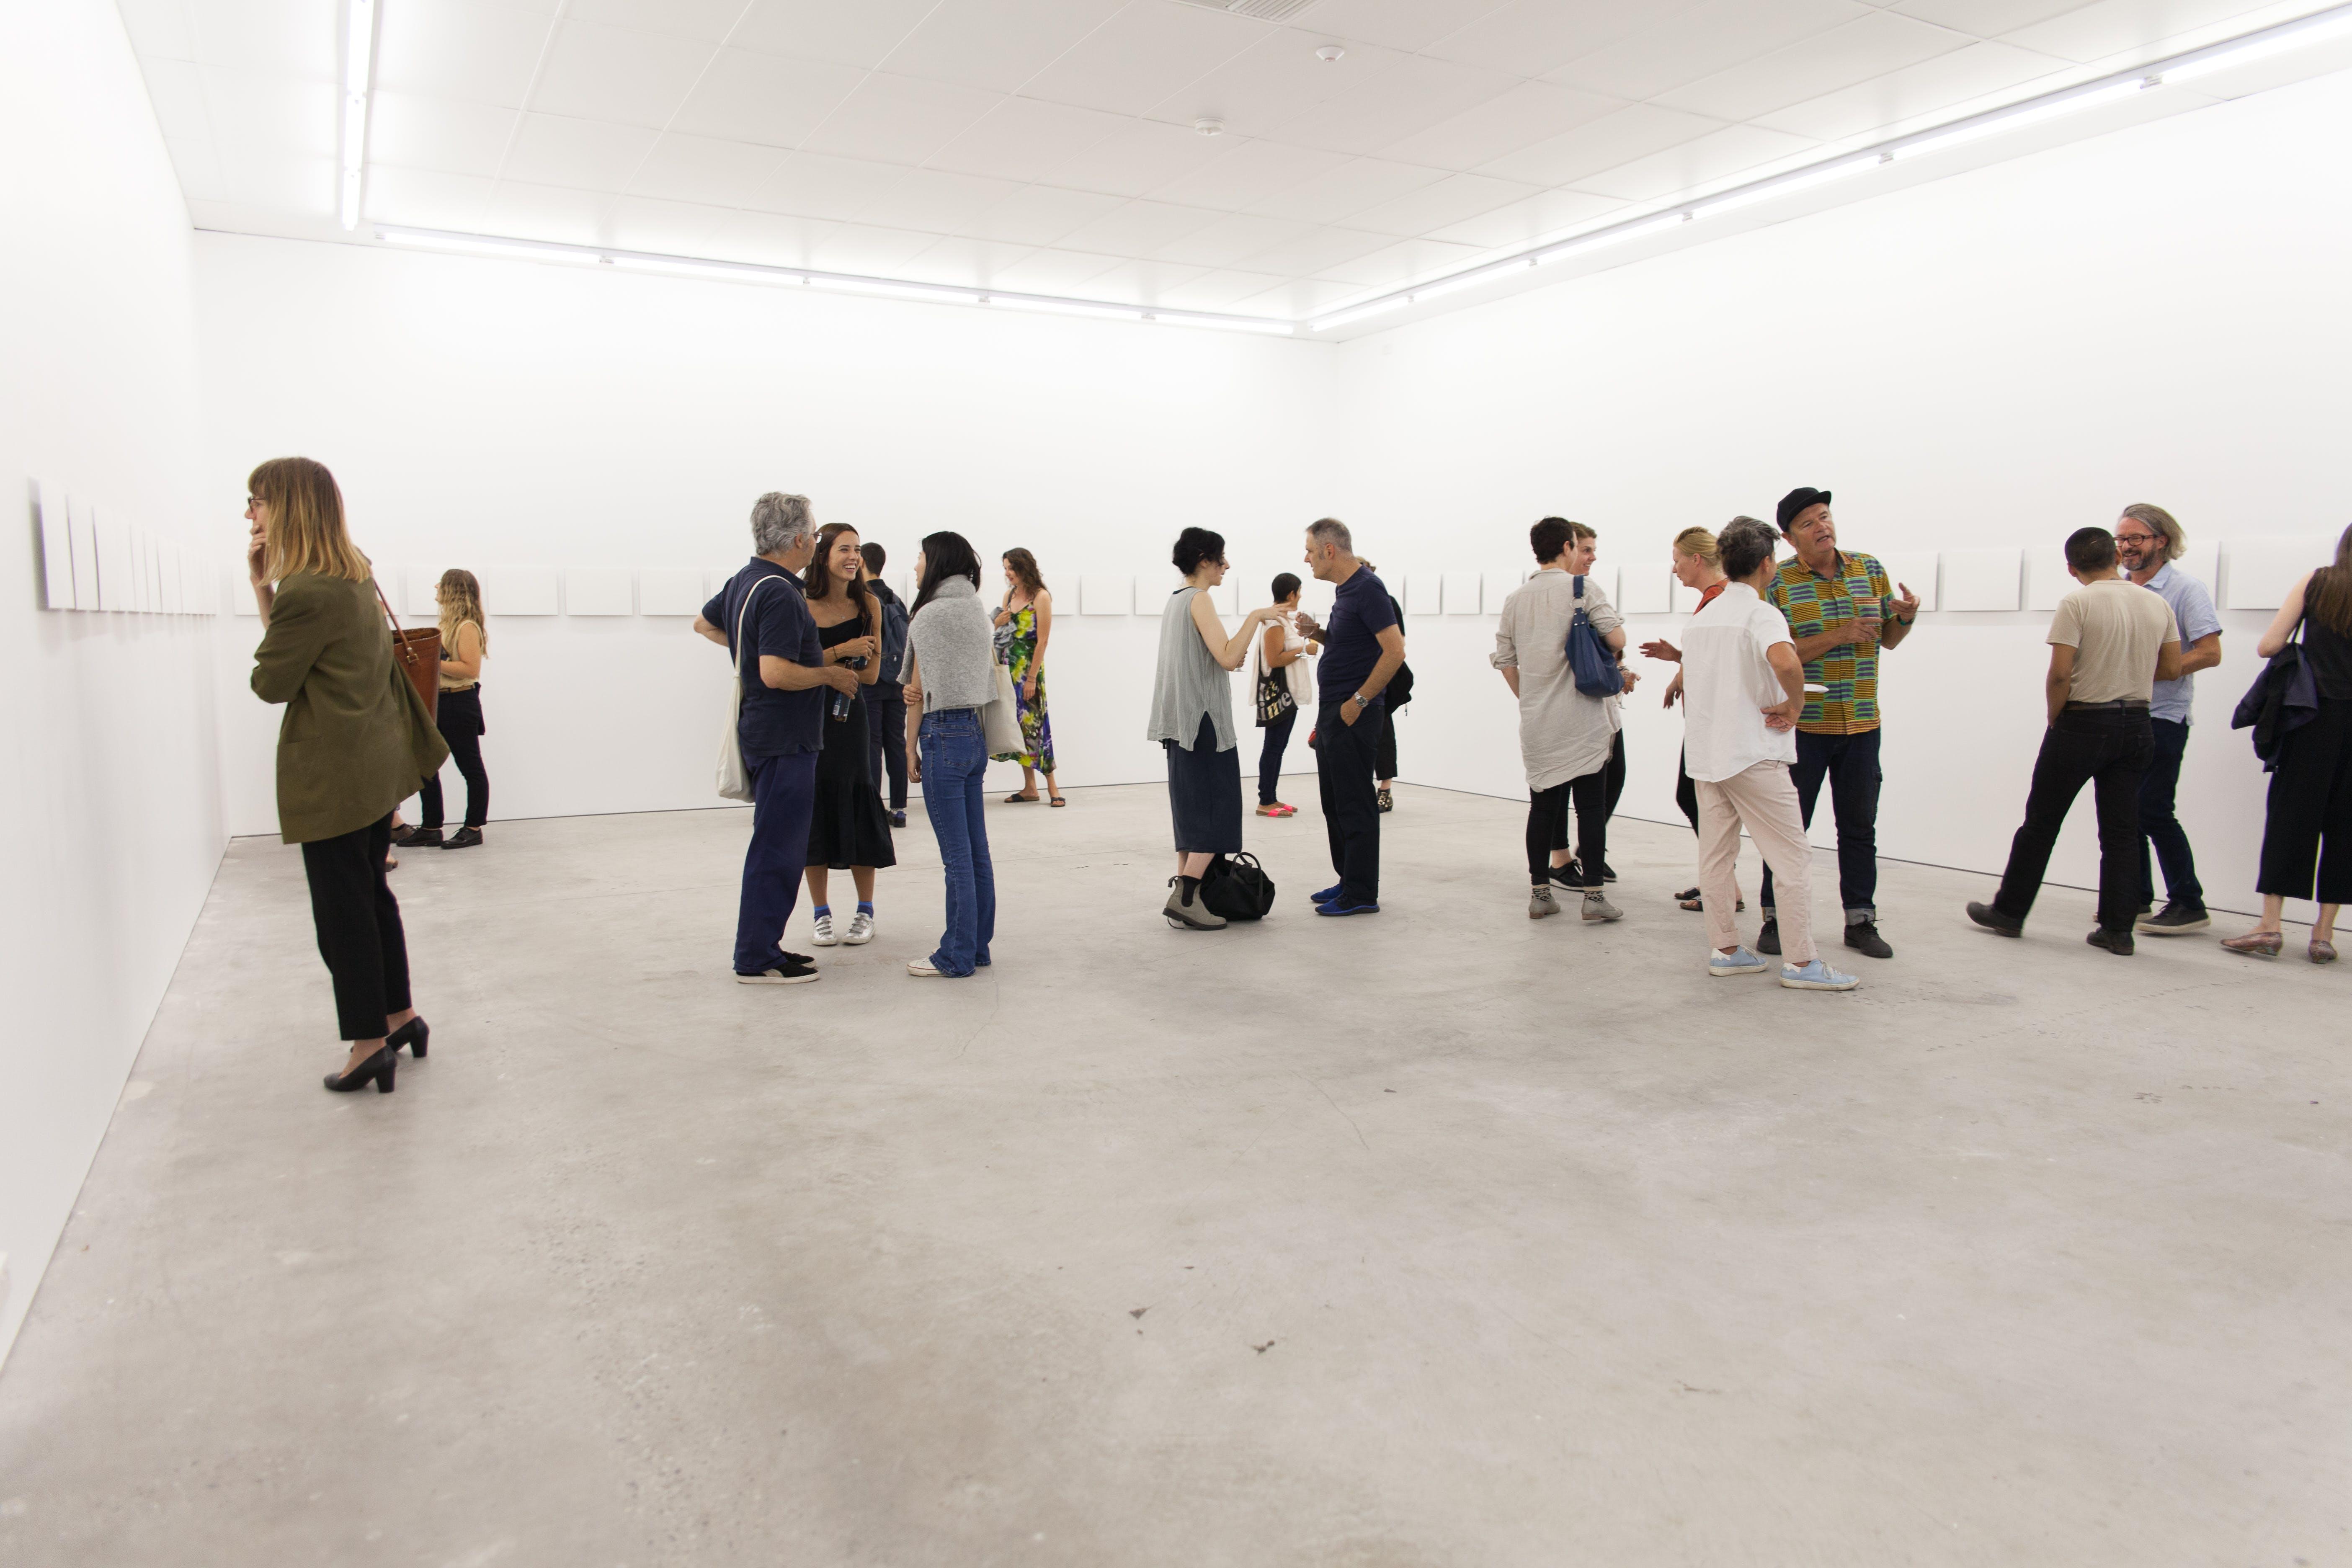 Visitors enjoying Sangeeta Sandrasegar, It's Like That, 2018 at Gertrude Contemporary. Photo by Daniel Gardeazabal.